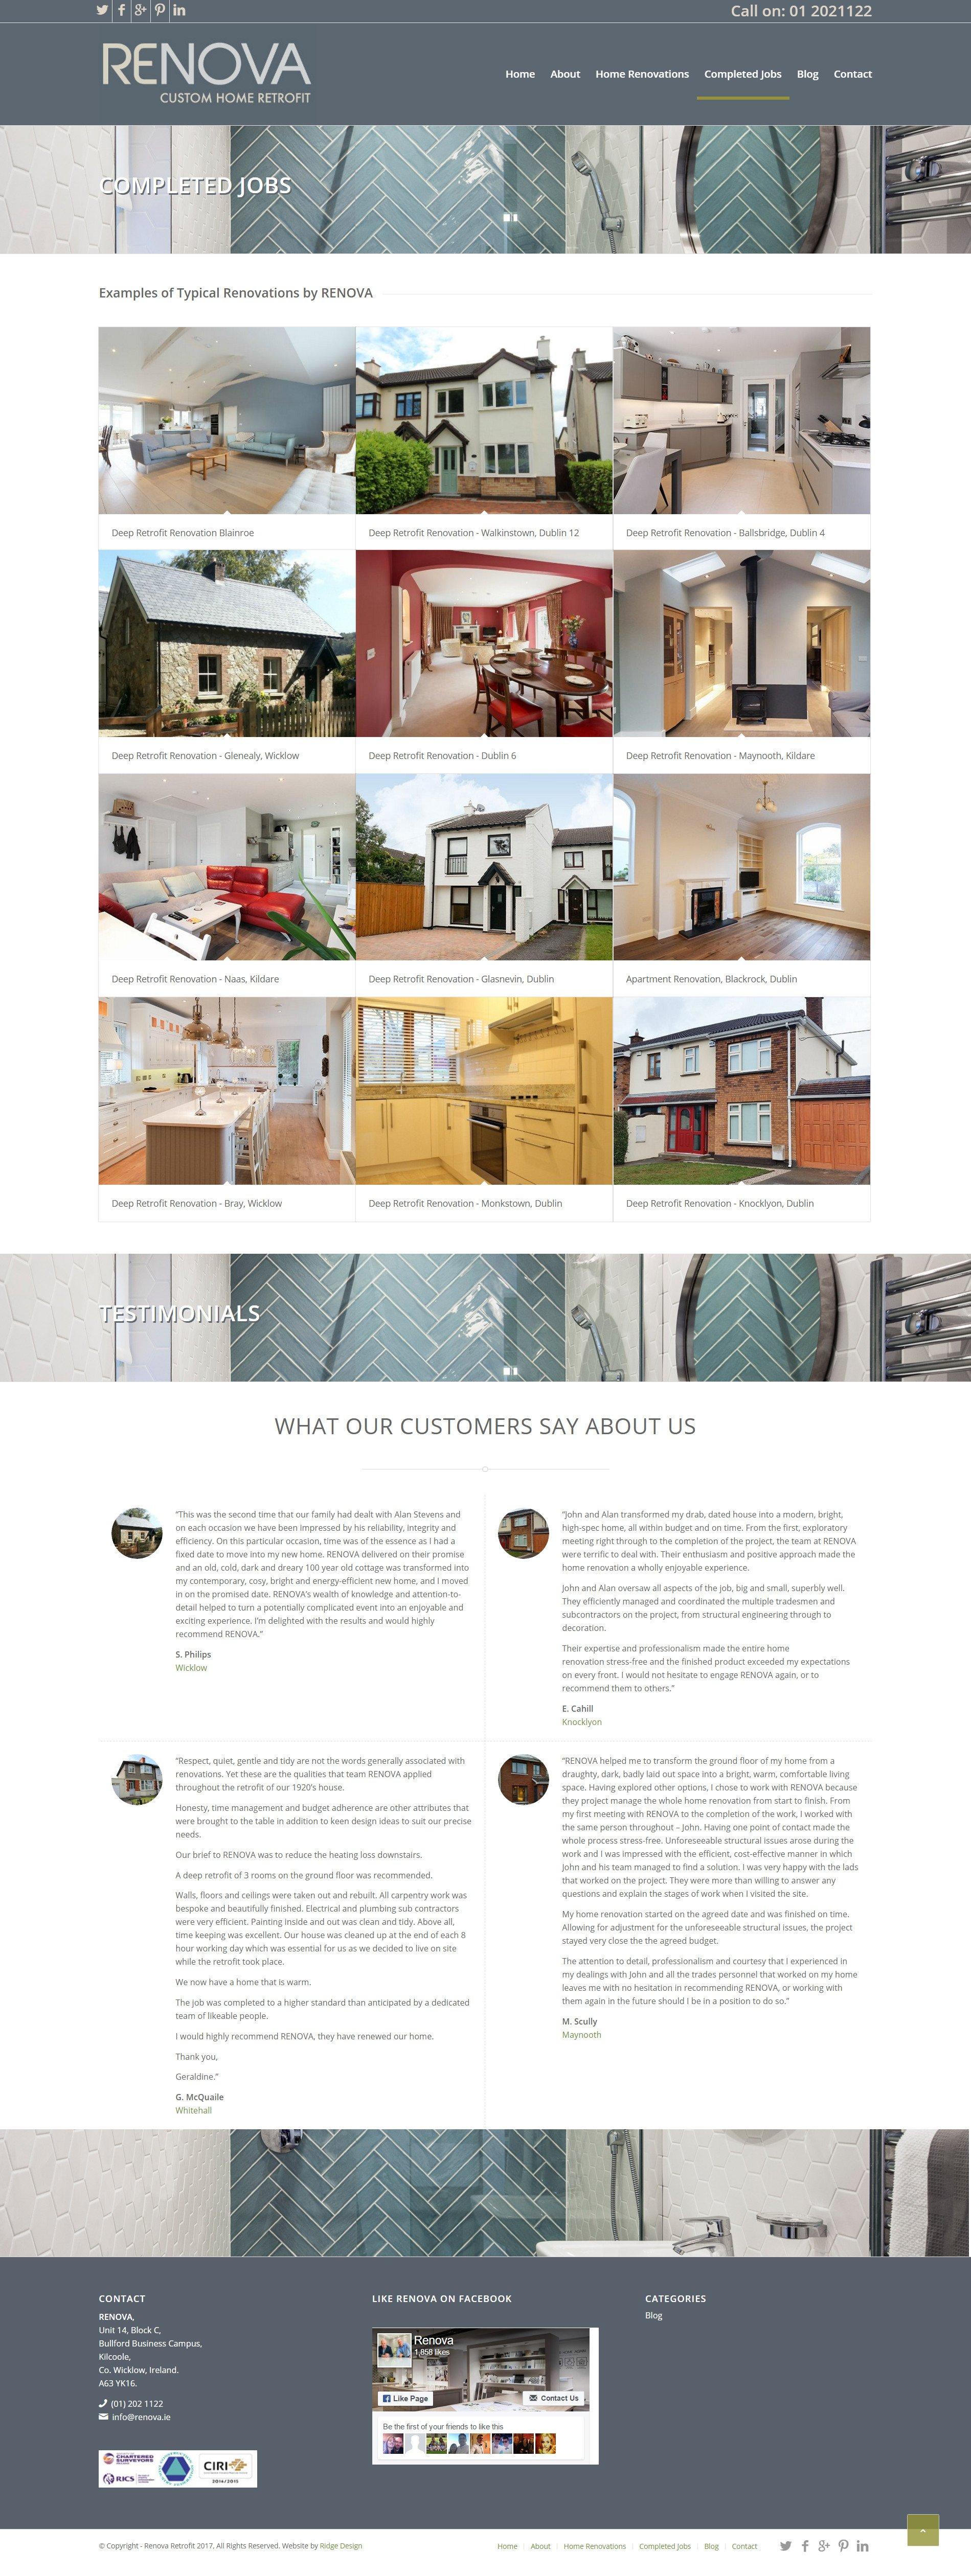 Ridge-Design-Website-Design-For-Renova-Renovations